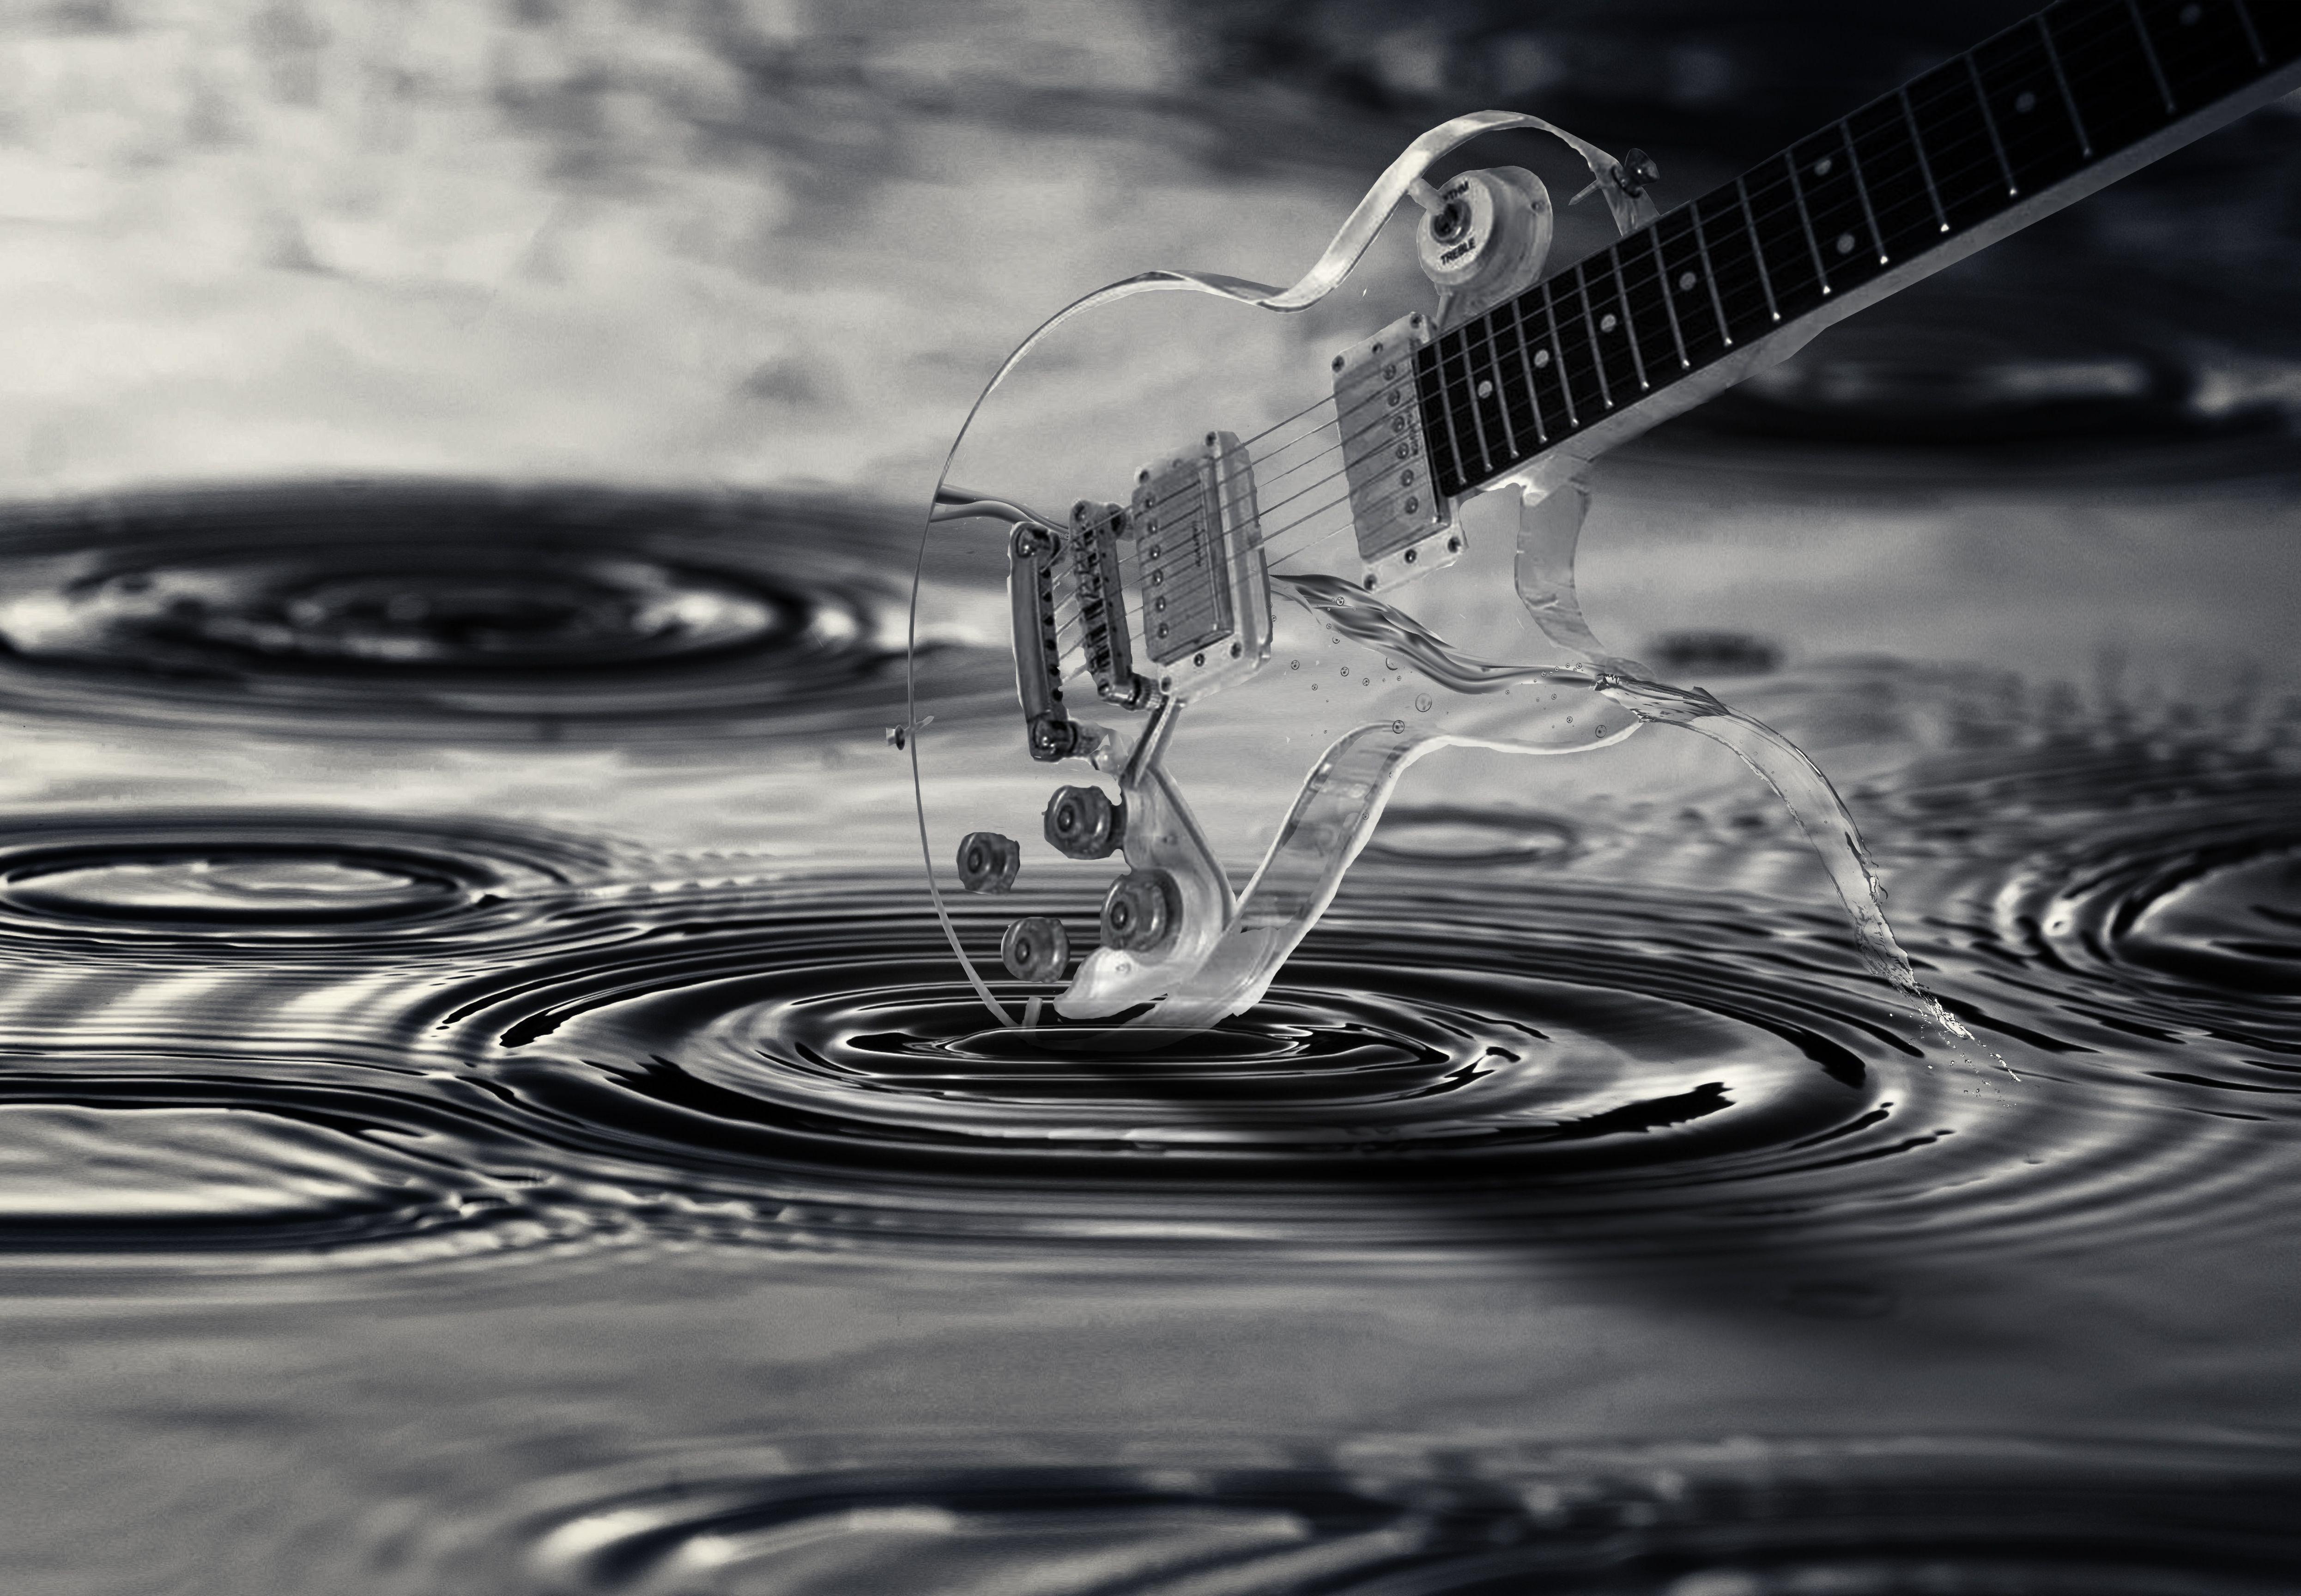 High Resolution Wallpaper Guitar Wallpaper Backgrounds Music Wallpaper Background Images